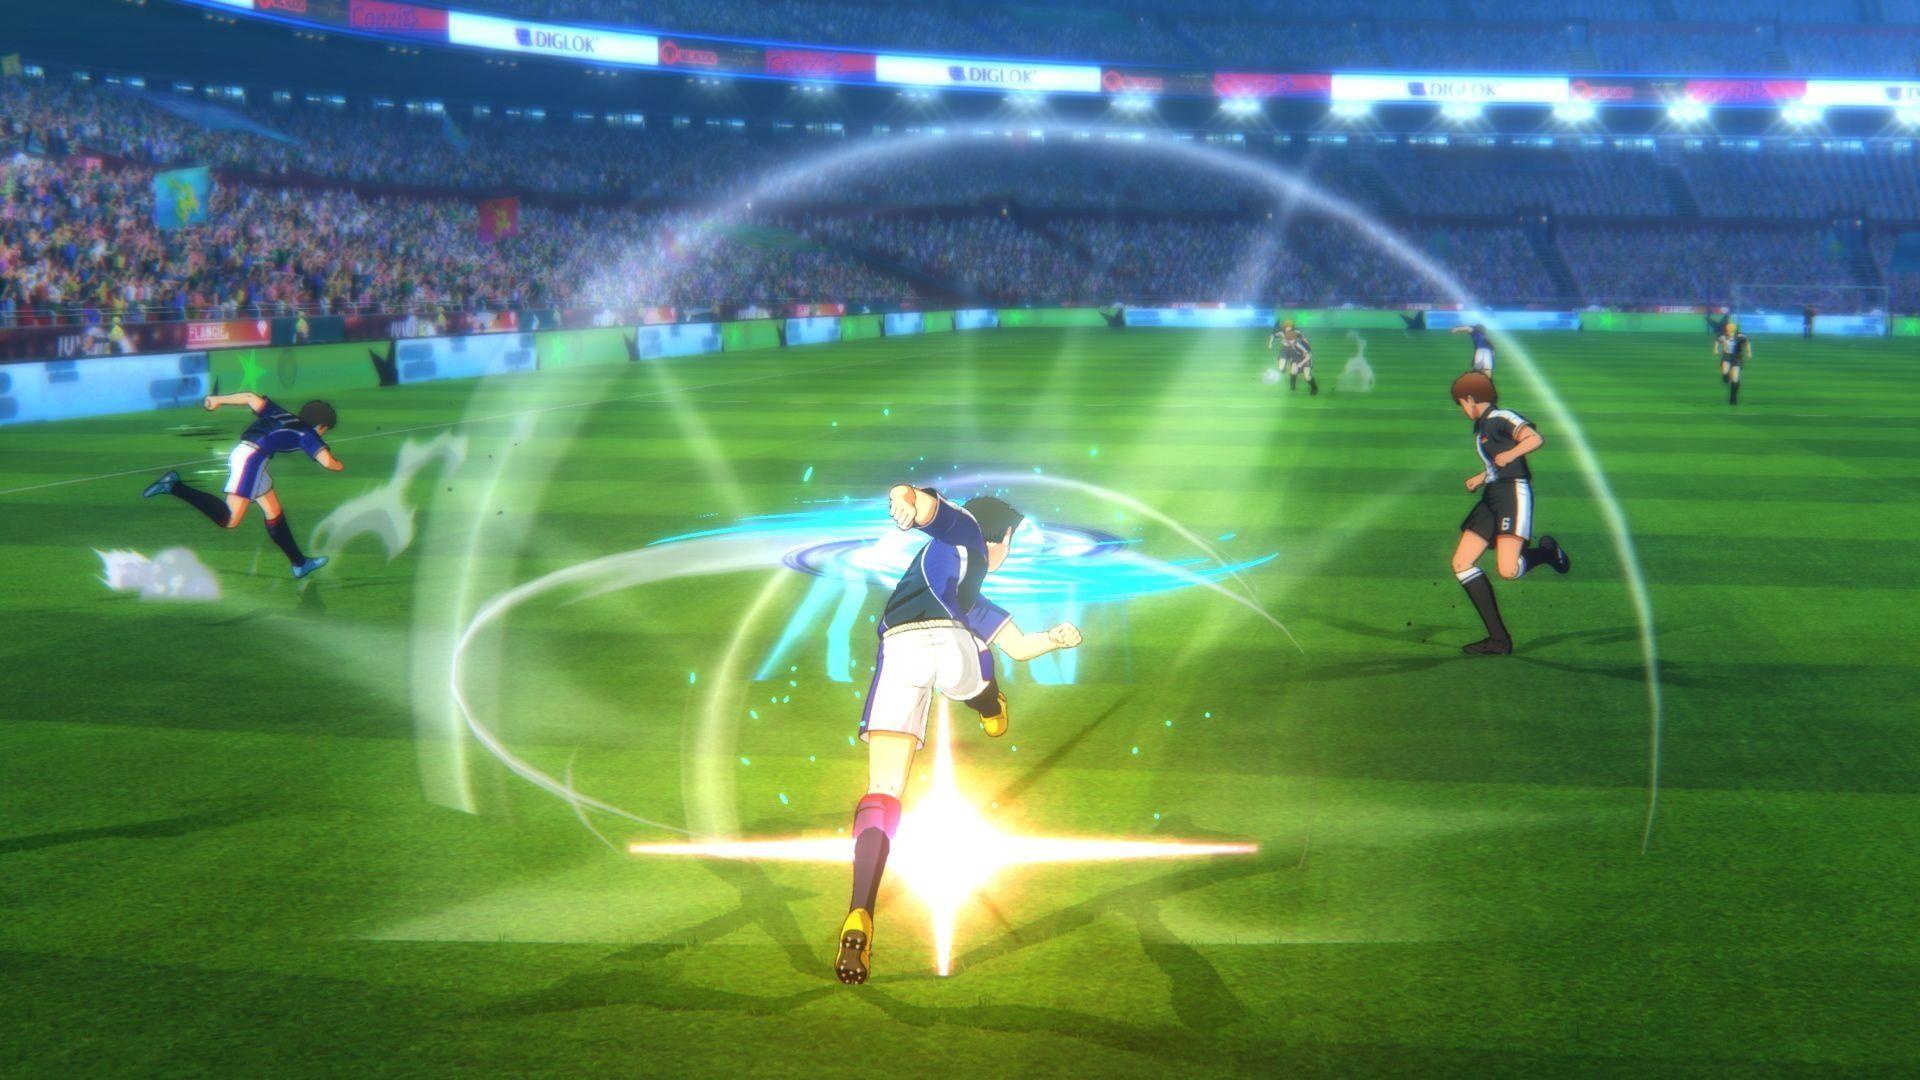 Captain Tsubasa: Rise of New Champions (PS4) - 5